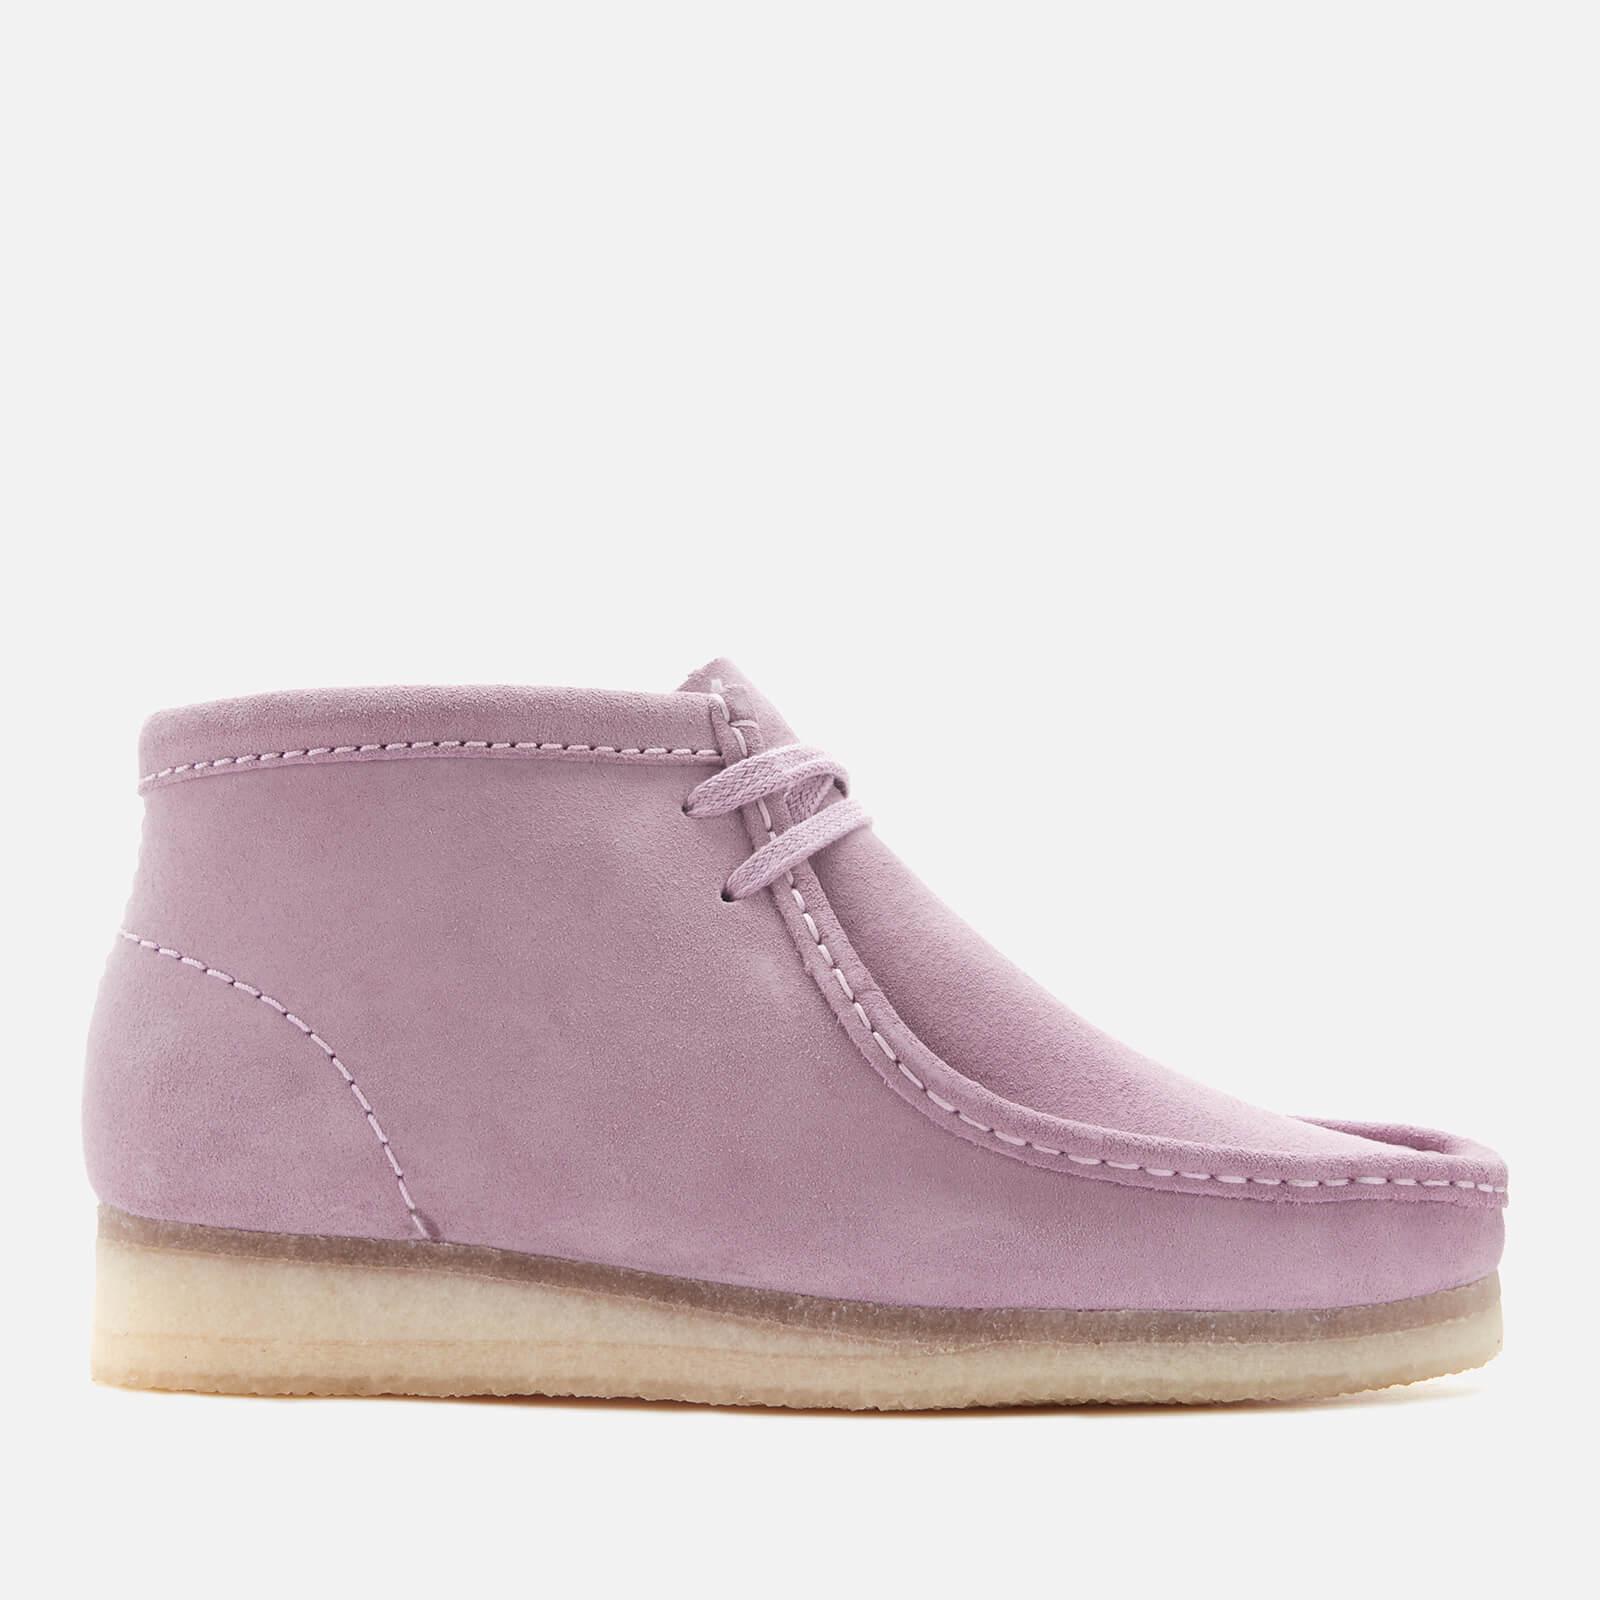 Clarks Originals Women's Wallabee Suede Shoes - Lavender - UK 4